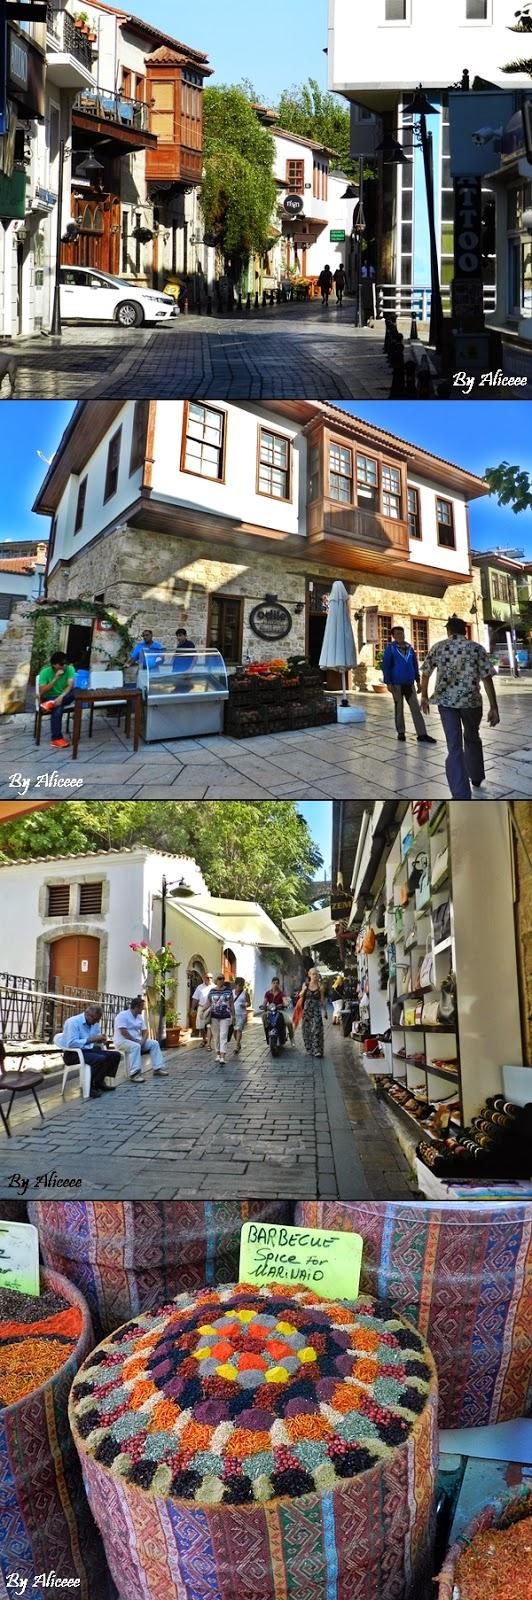 obiective-turistice-antalya-turcia